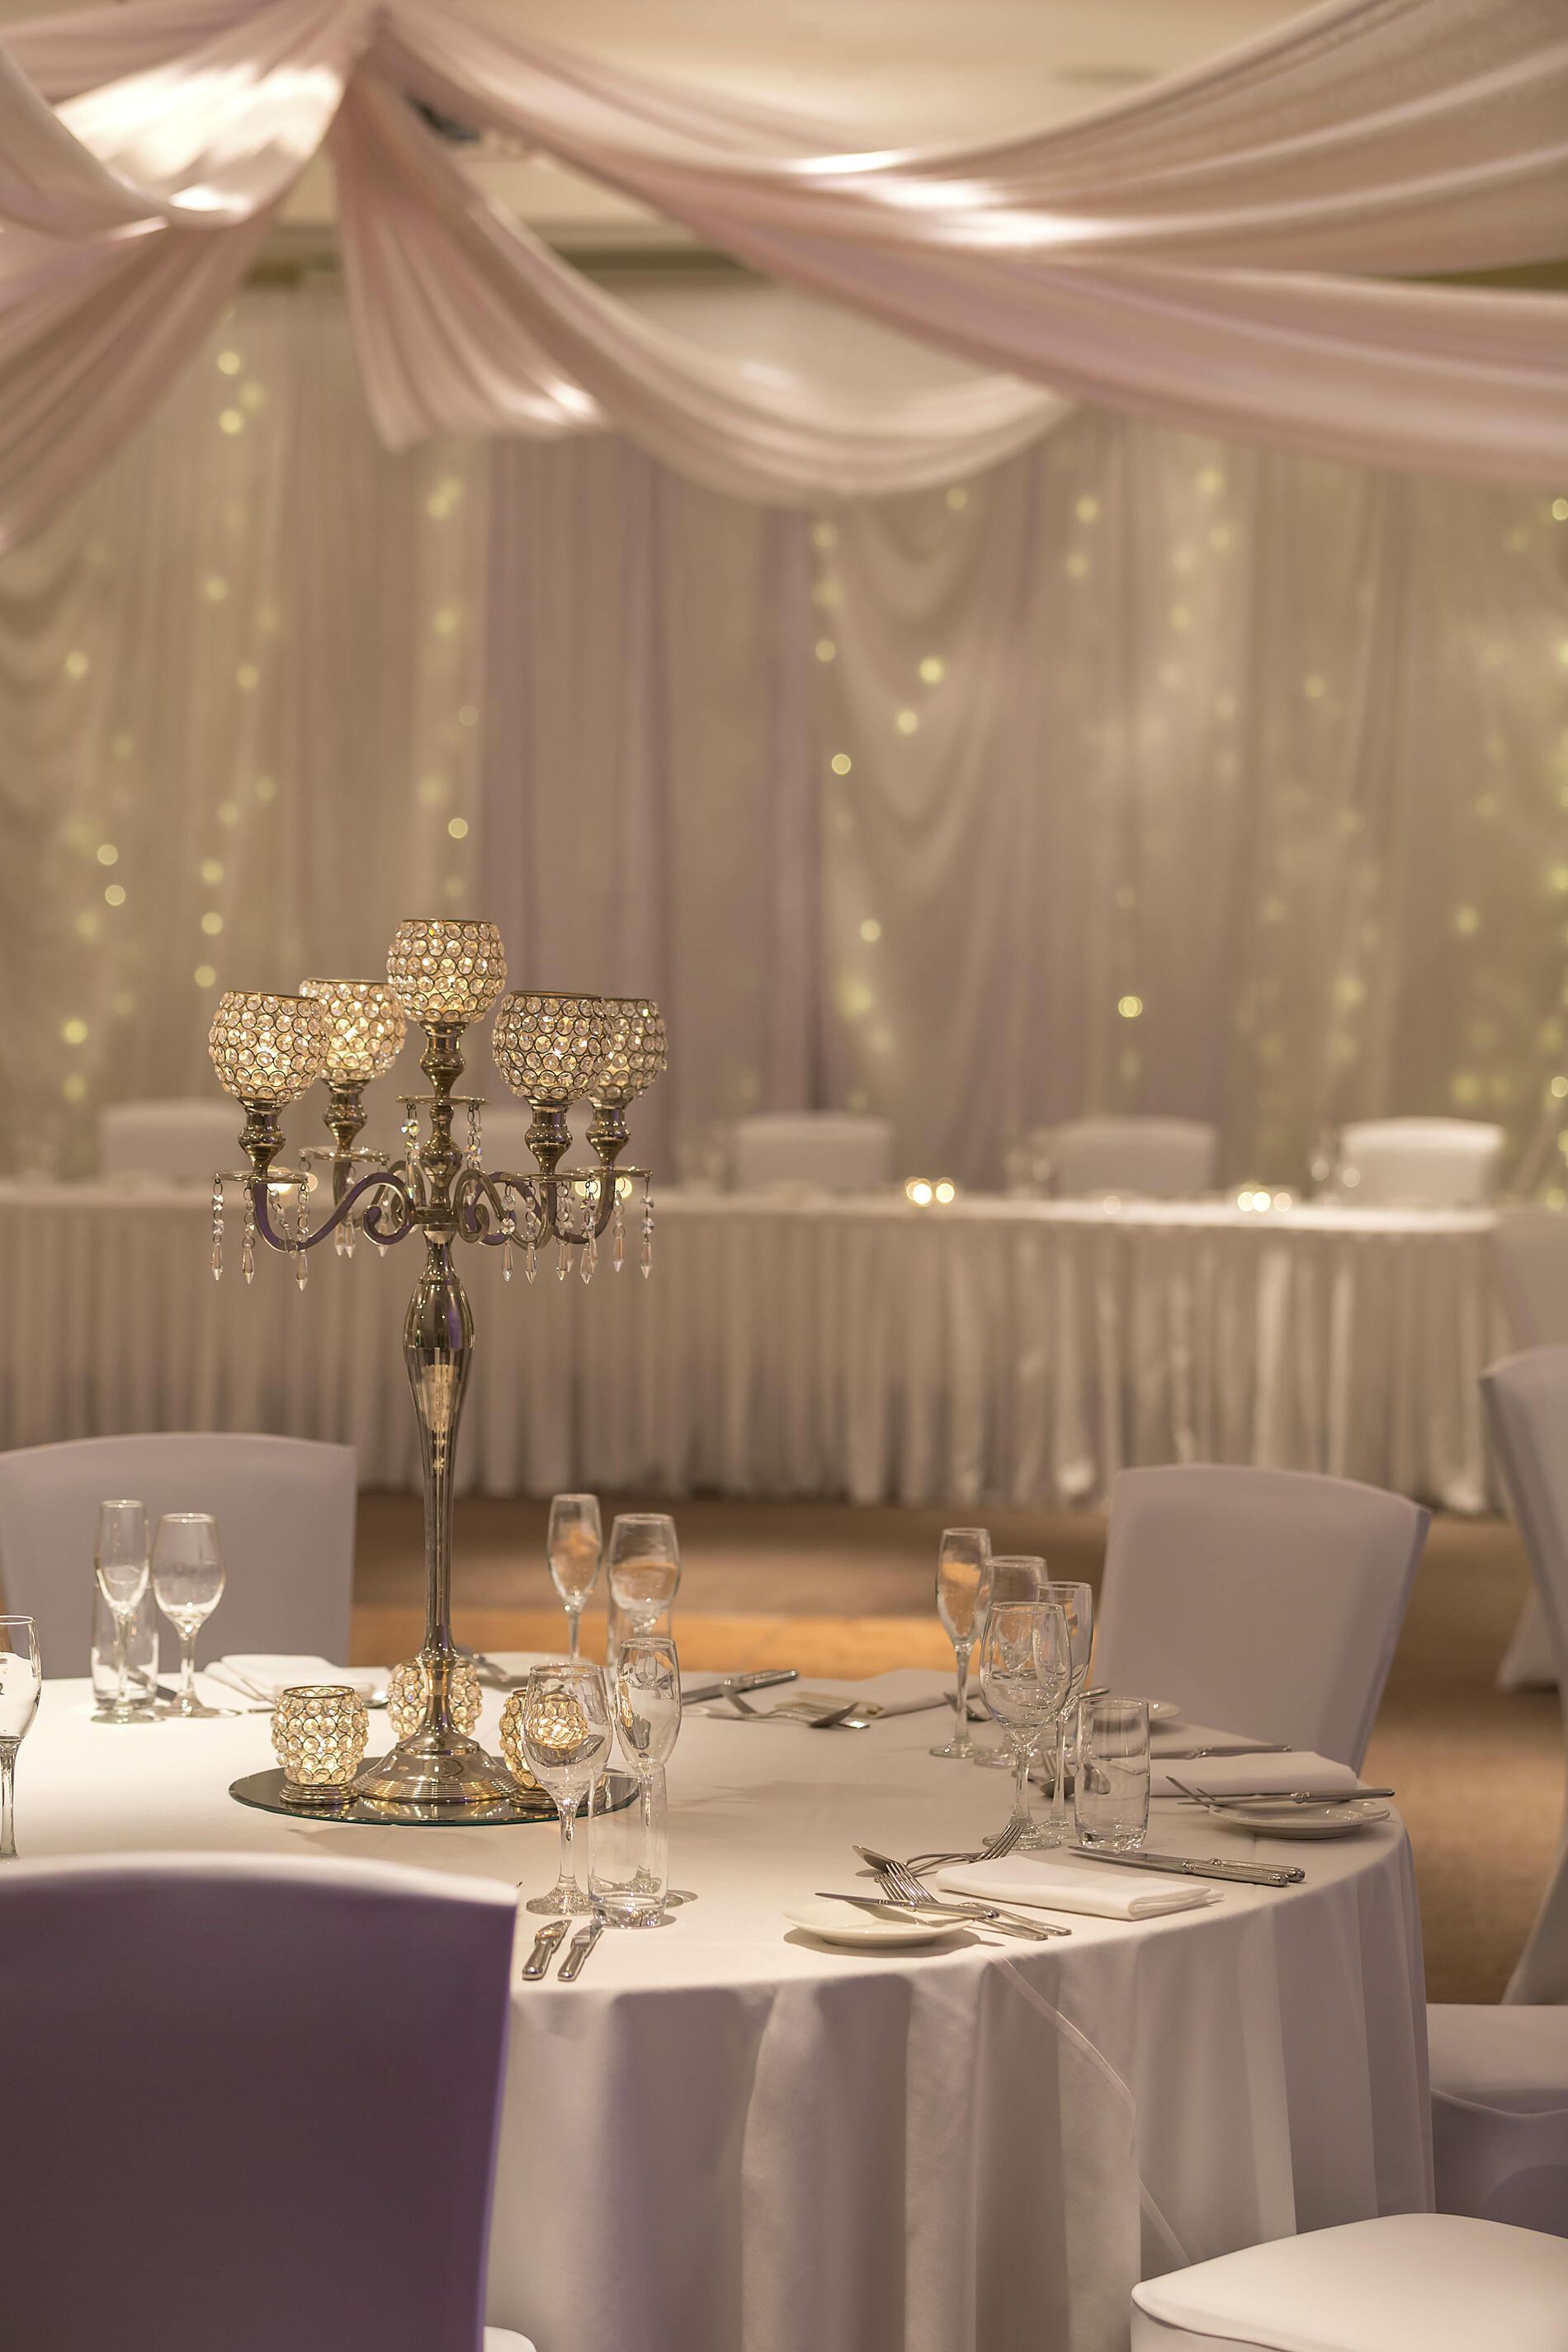 Wedding Venue Set Up - Getting Married in Yarra Valley Lodge